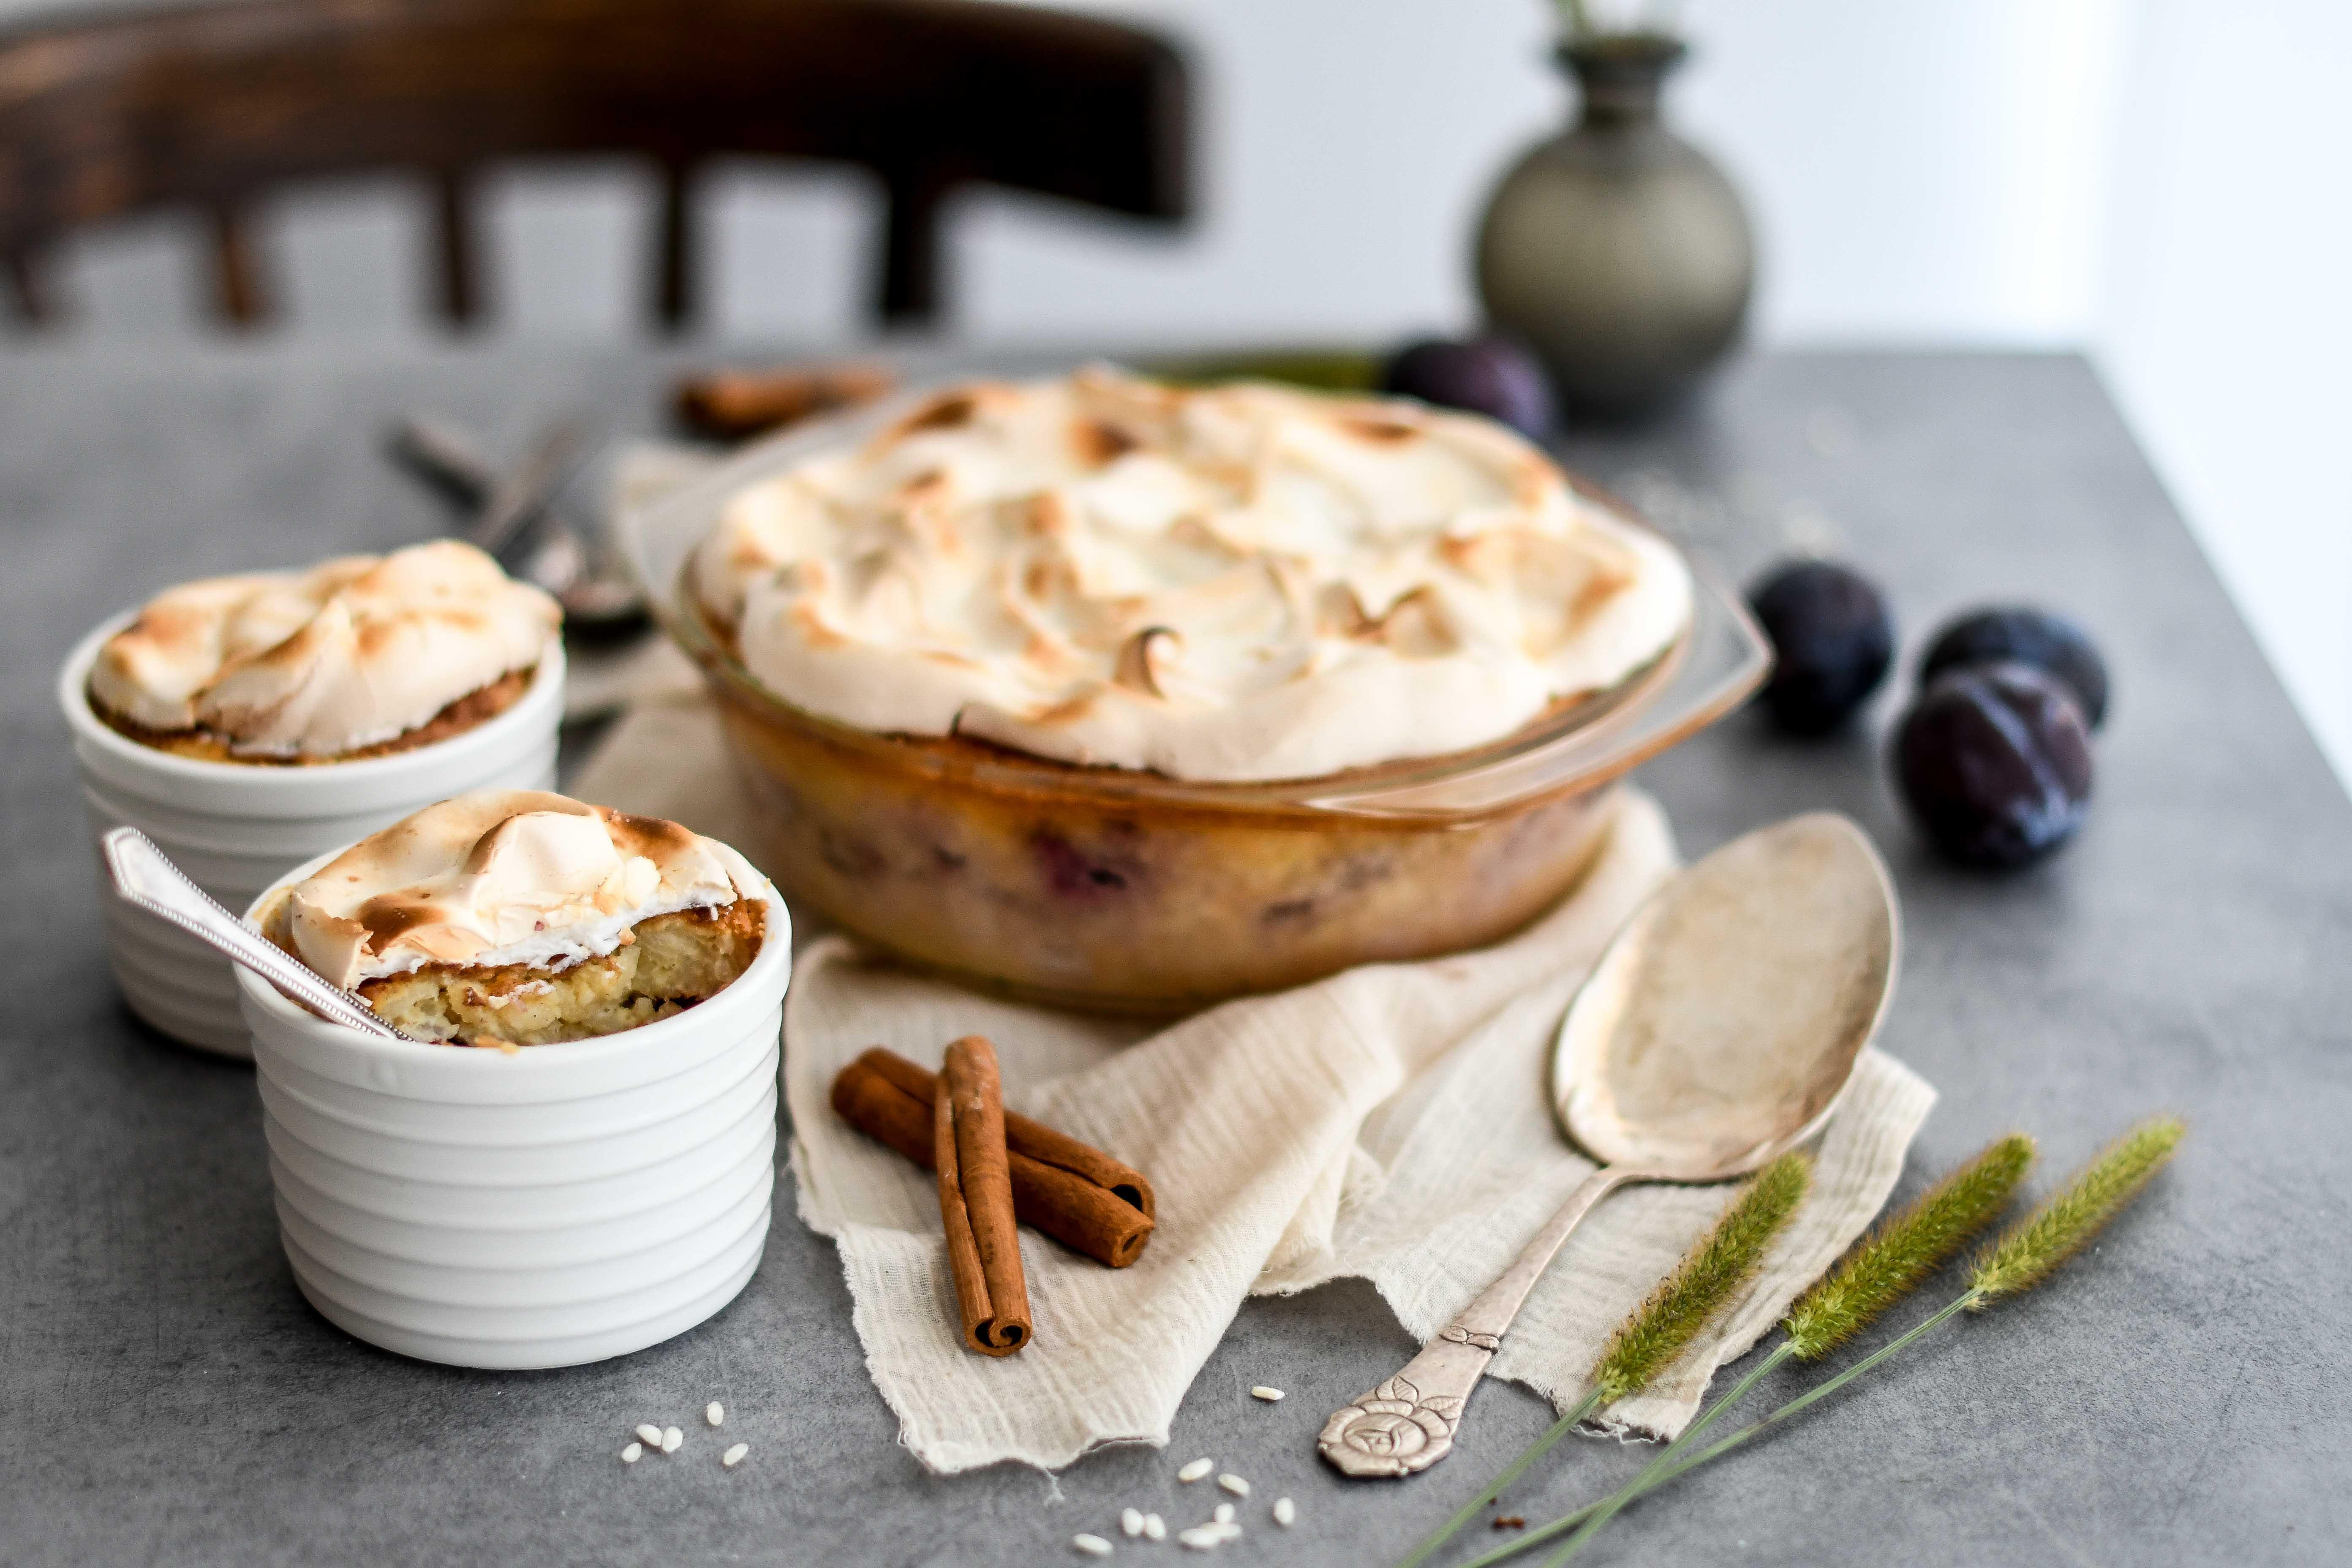 ryzovy nakyp / rice pudding